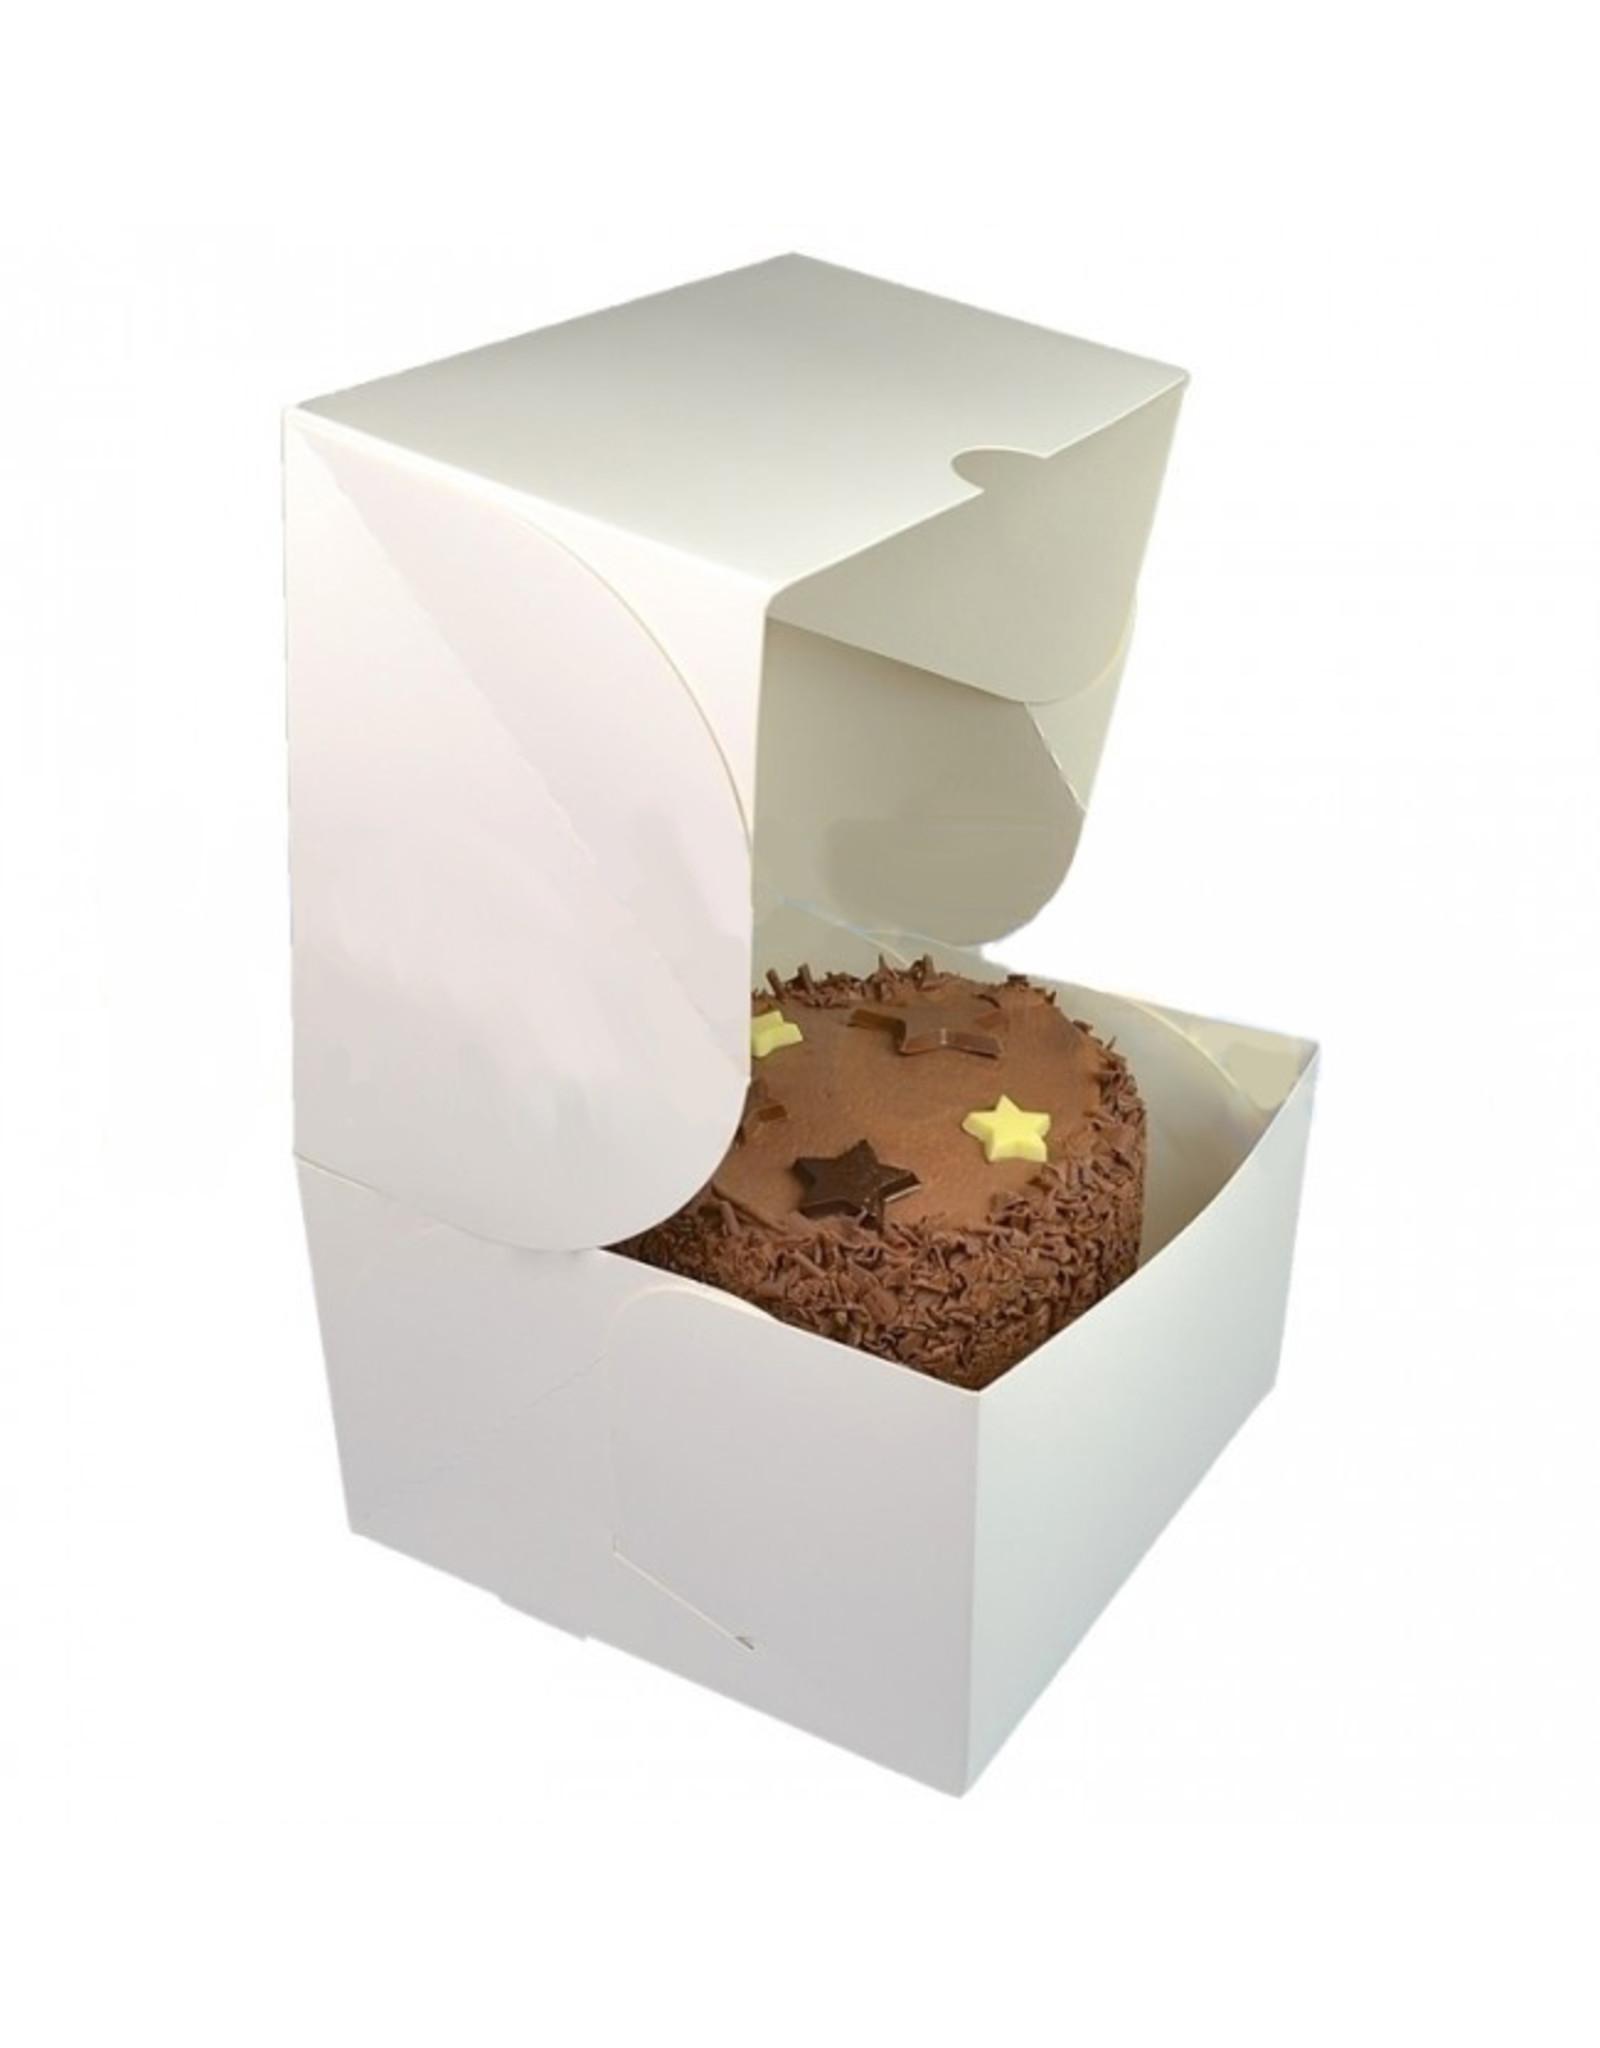 White window cake box - 25x25x15 (per 25 pieces)